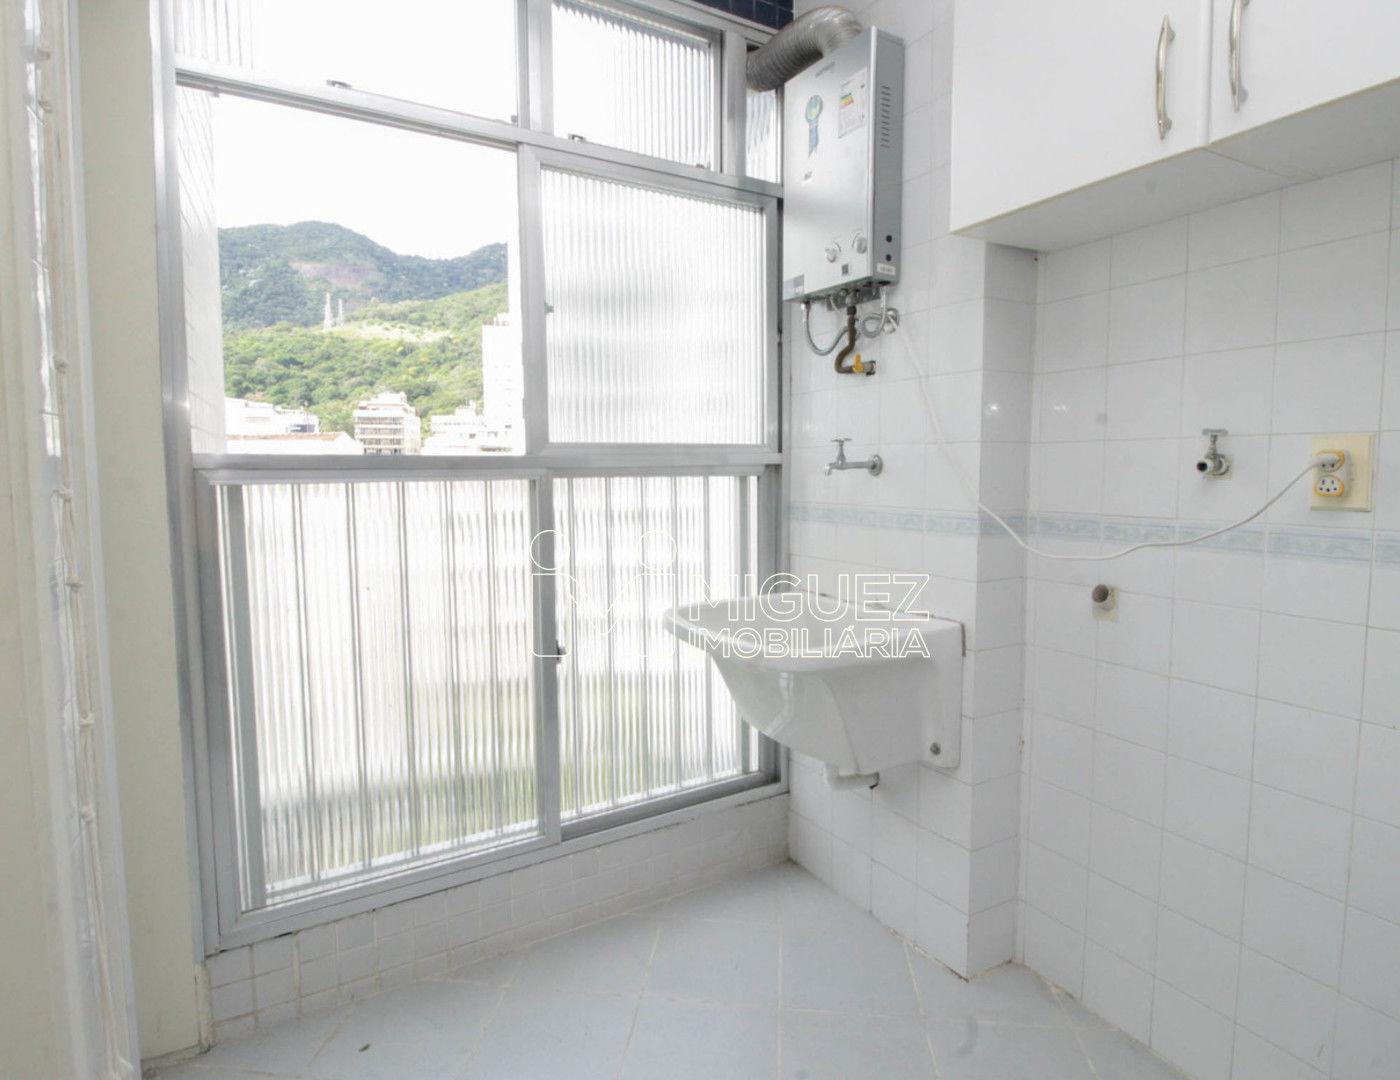 Apartamento, venda, Avenida Maracanã - Tijuca , Rio de janeiro